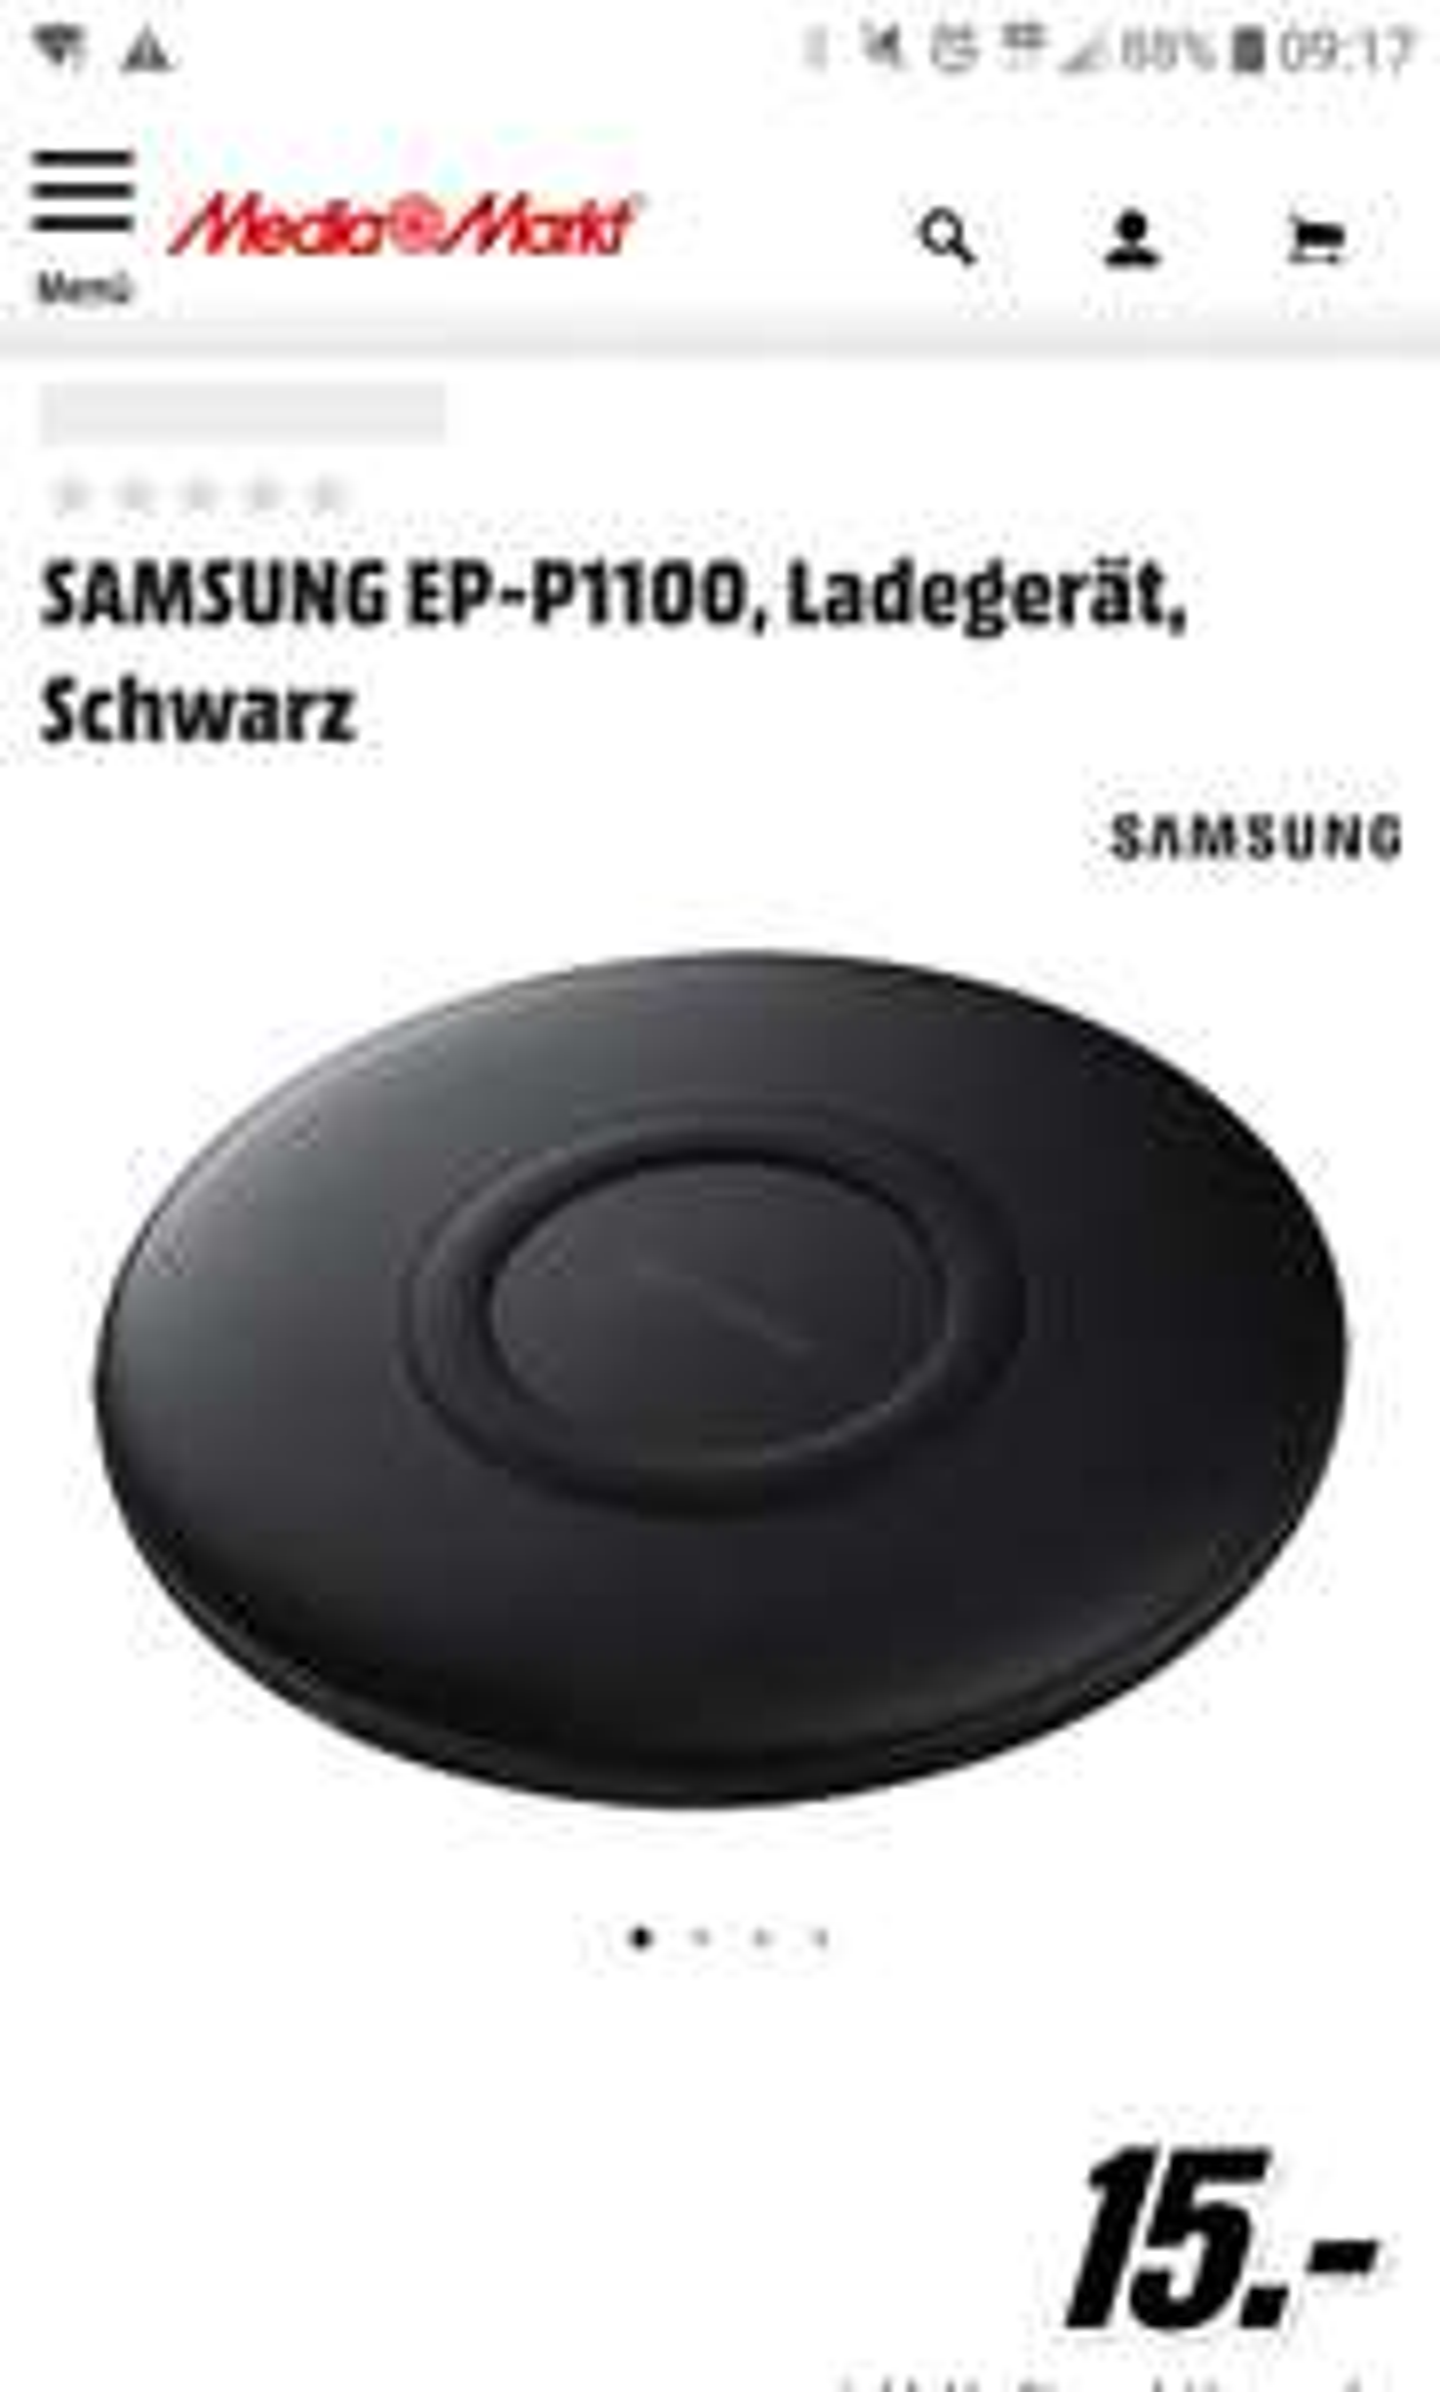 SAMSUNG EP-P1100, Qi Ladegerät mit USB-C bei Media Markt